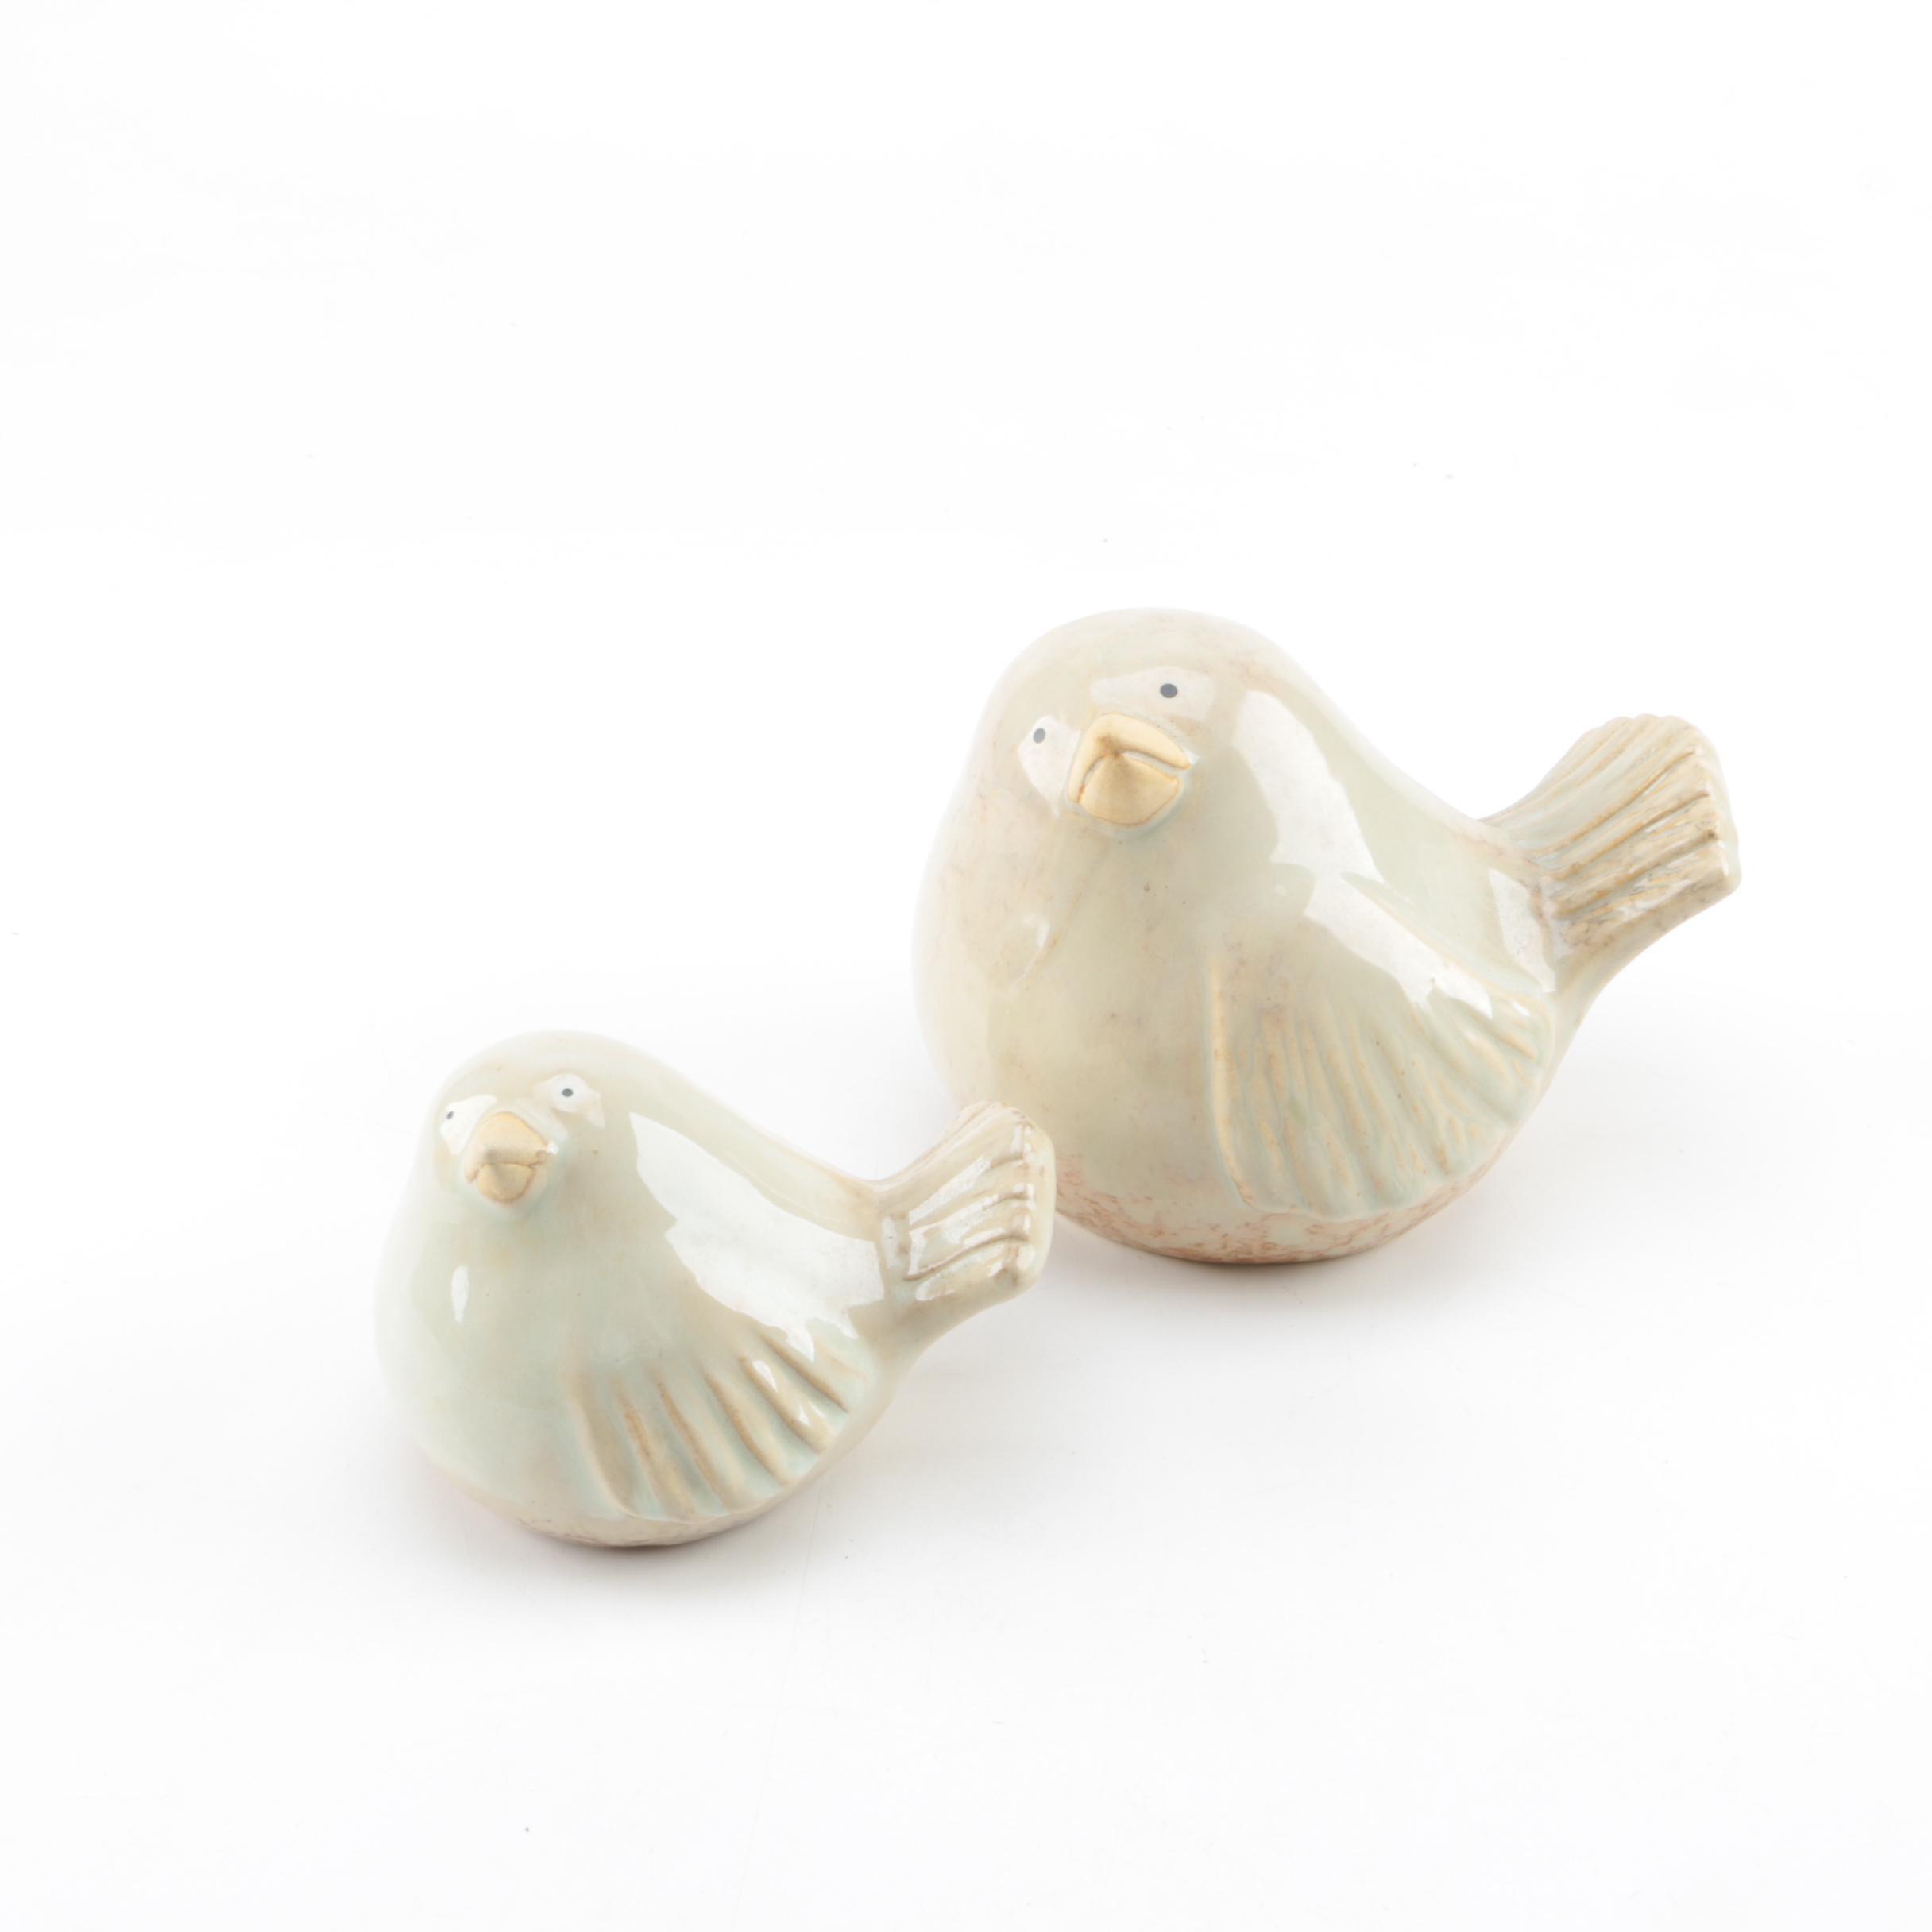 Pair of Glazed Ceramic Bird Figurines